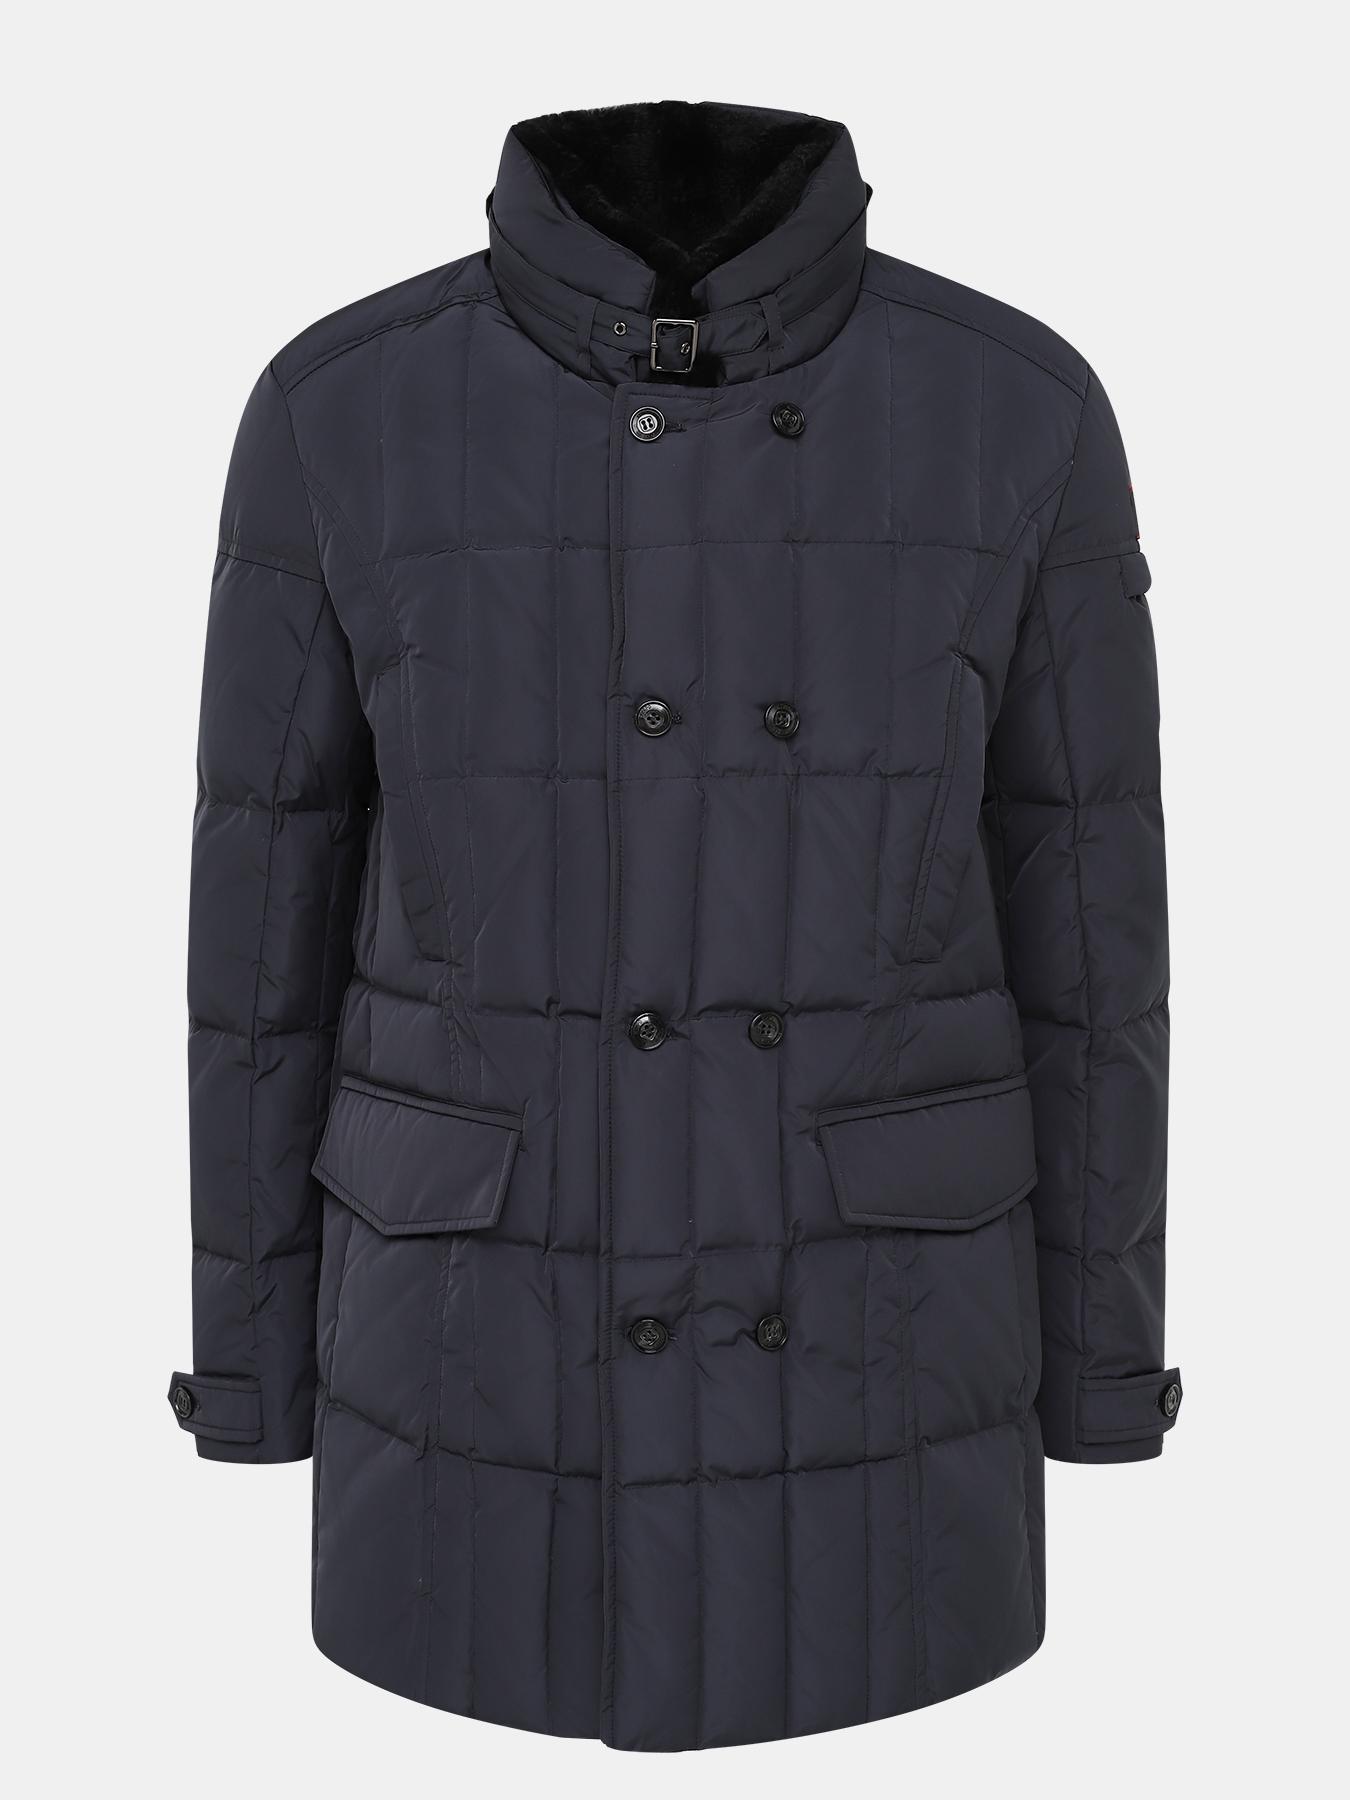 Пуховики Korpo Удлиненная куртка